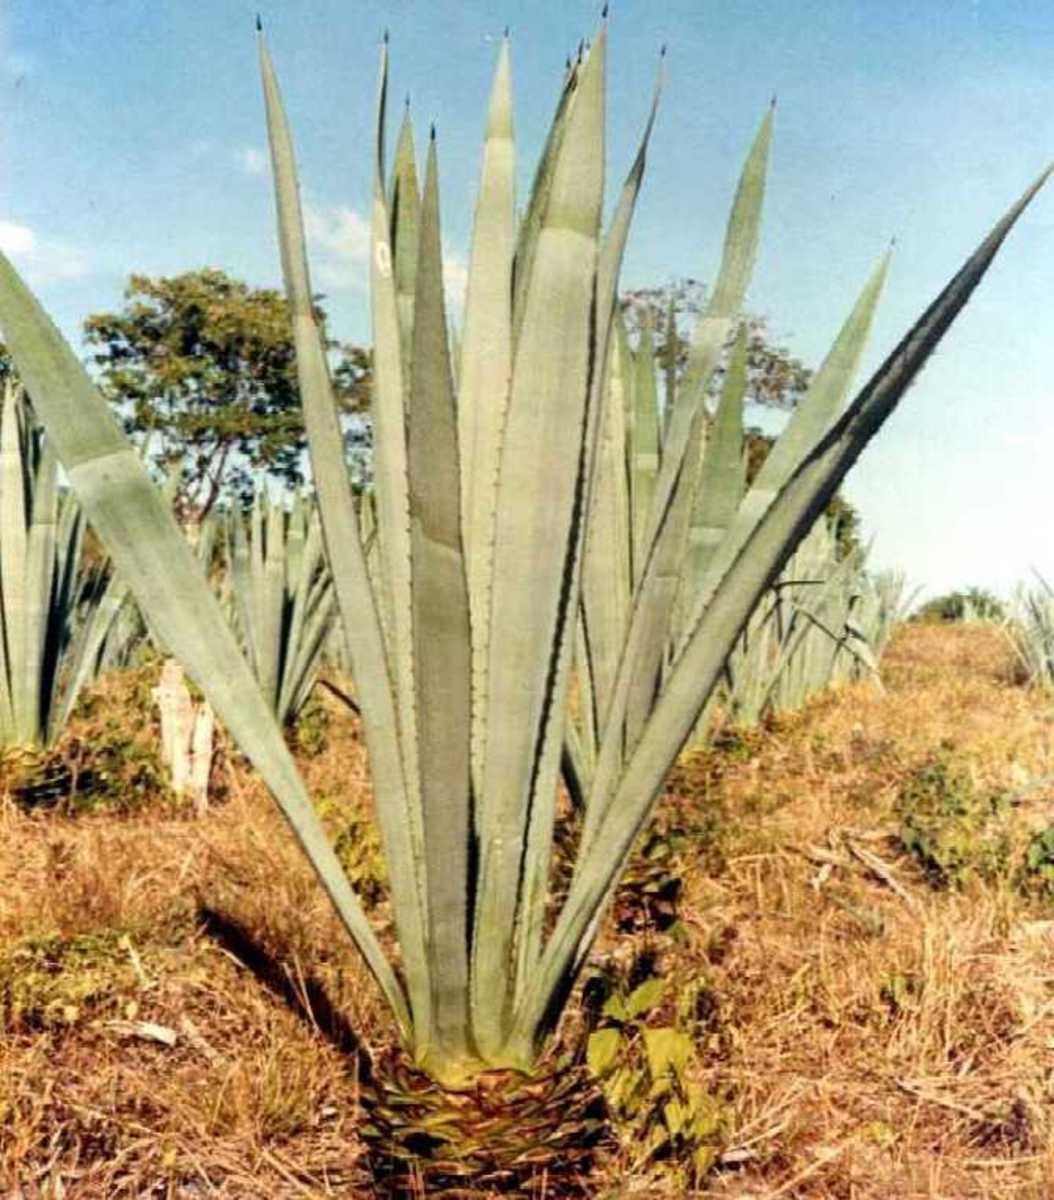 maguey plant